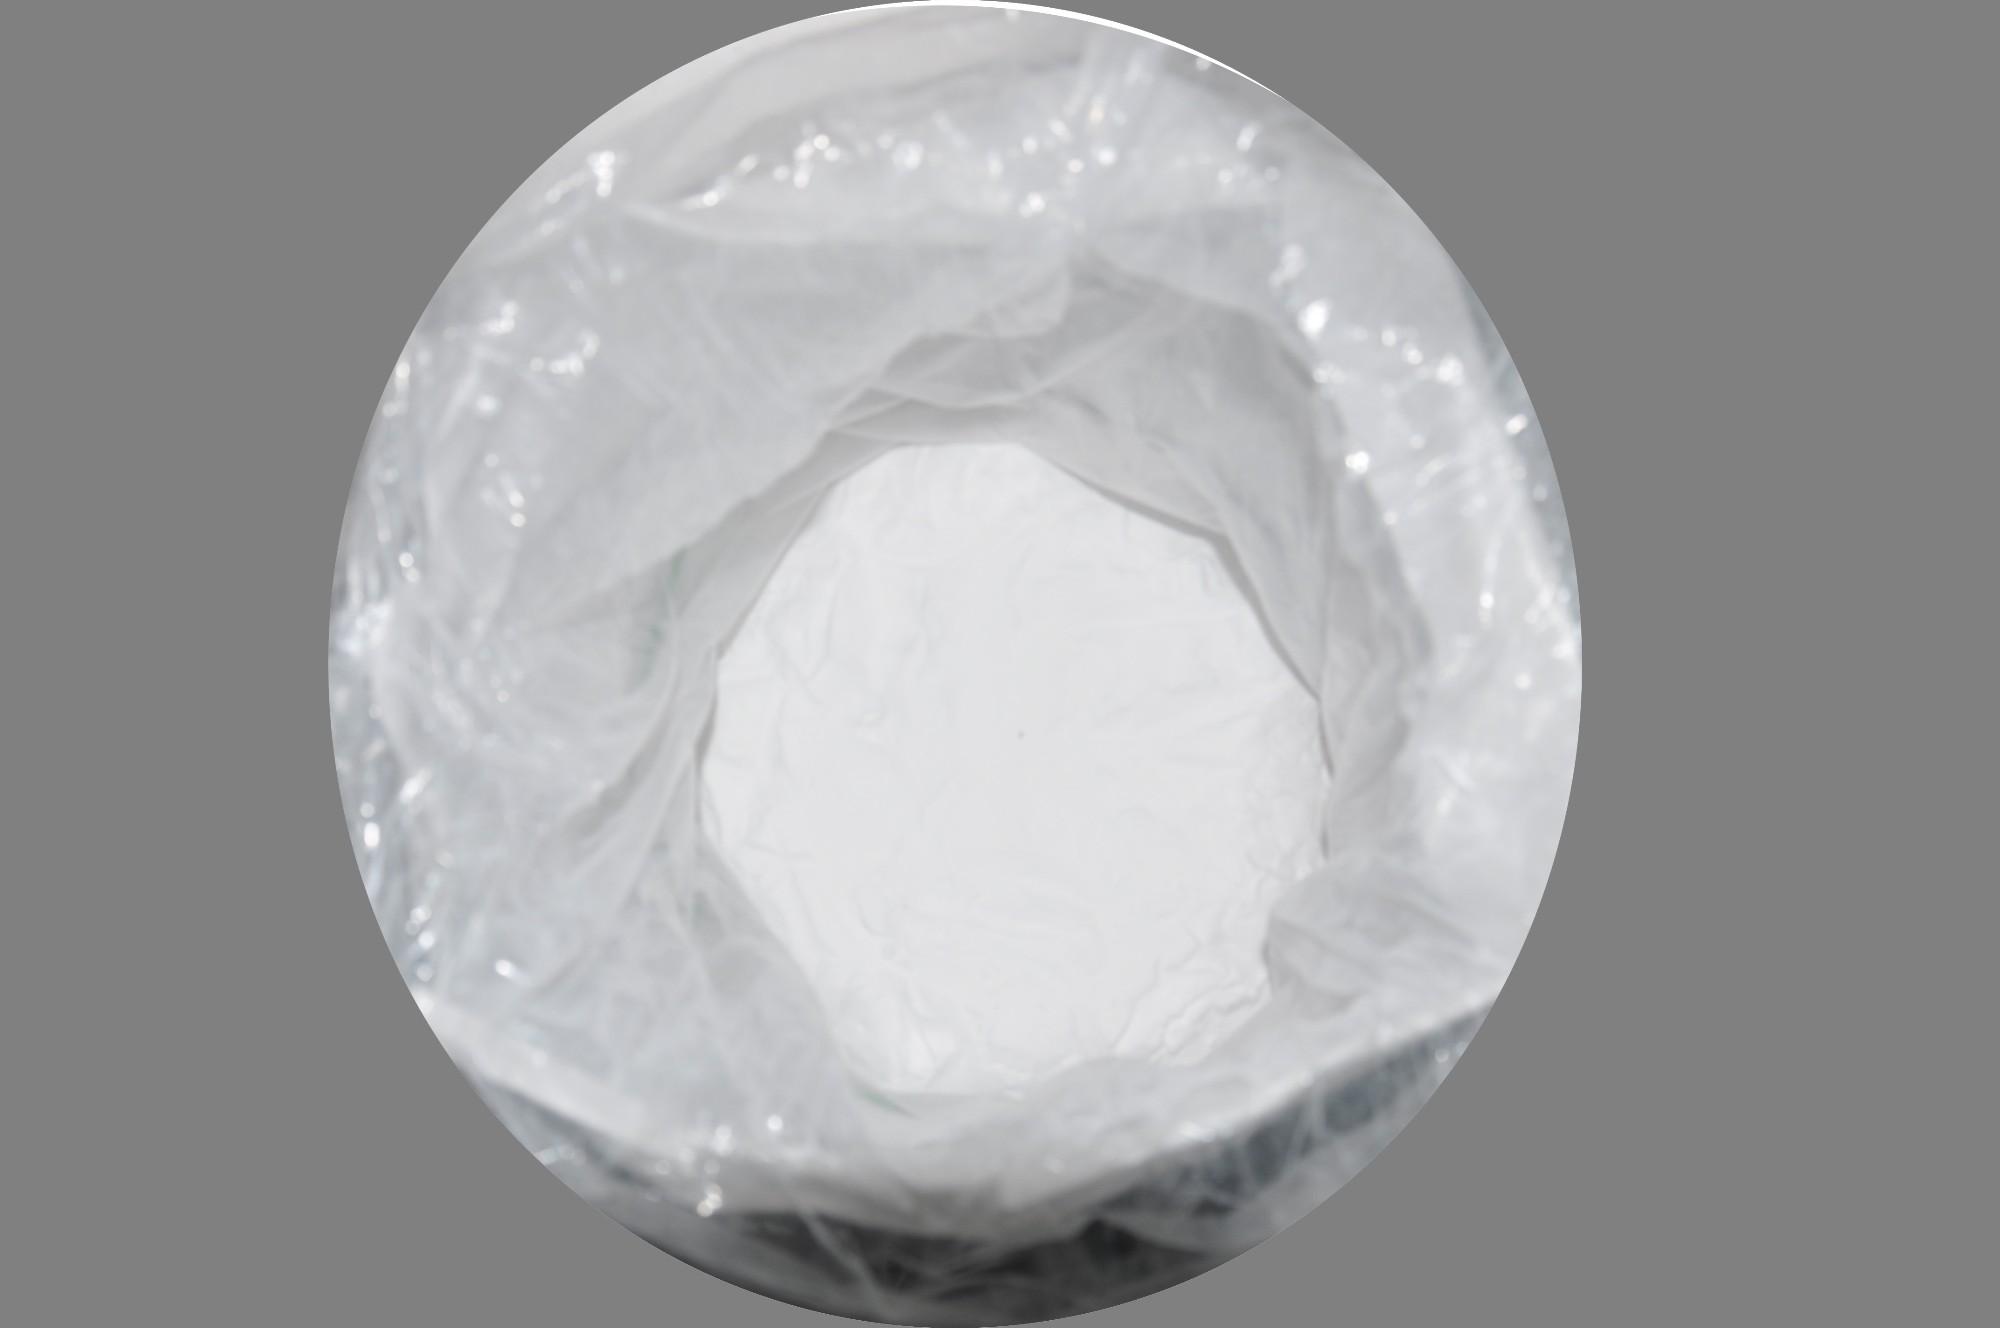 Kaufen Alkaline Aktive Poly Natriummetasilicat APSM;Alkaline Aktive Poly Natriummetasilicat APSM Preis;Alkaline Aktive Poly Natriummetasilicat APSM Marken;Alkaline Aktive Poly Natriummetasilicat APSM Hersteller;Alkaline Aktive Poly Natriummetasilicat APSM Zitat;Alkaline Aktive Poly Natriummetasilicat APSM Unternehmen